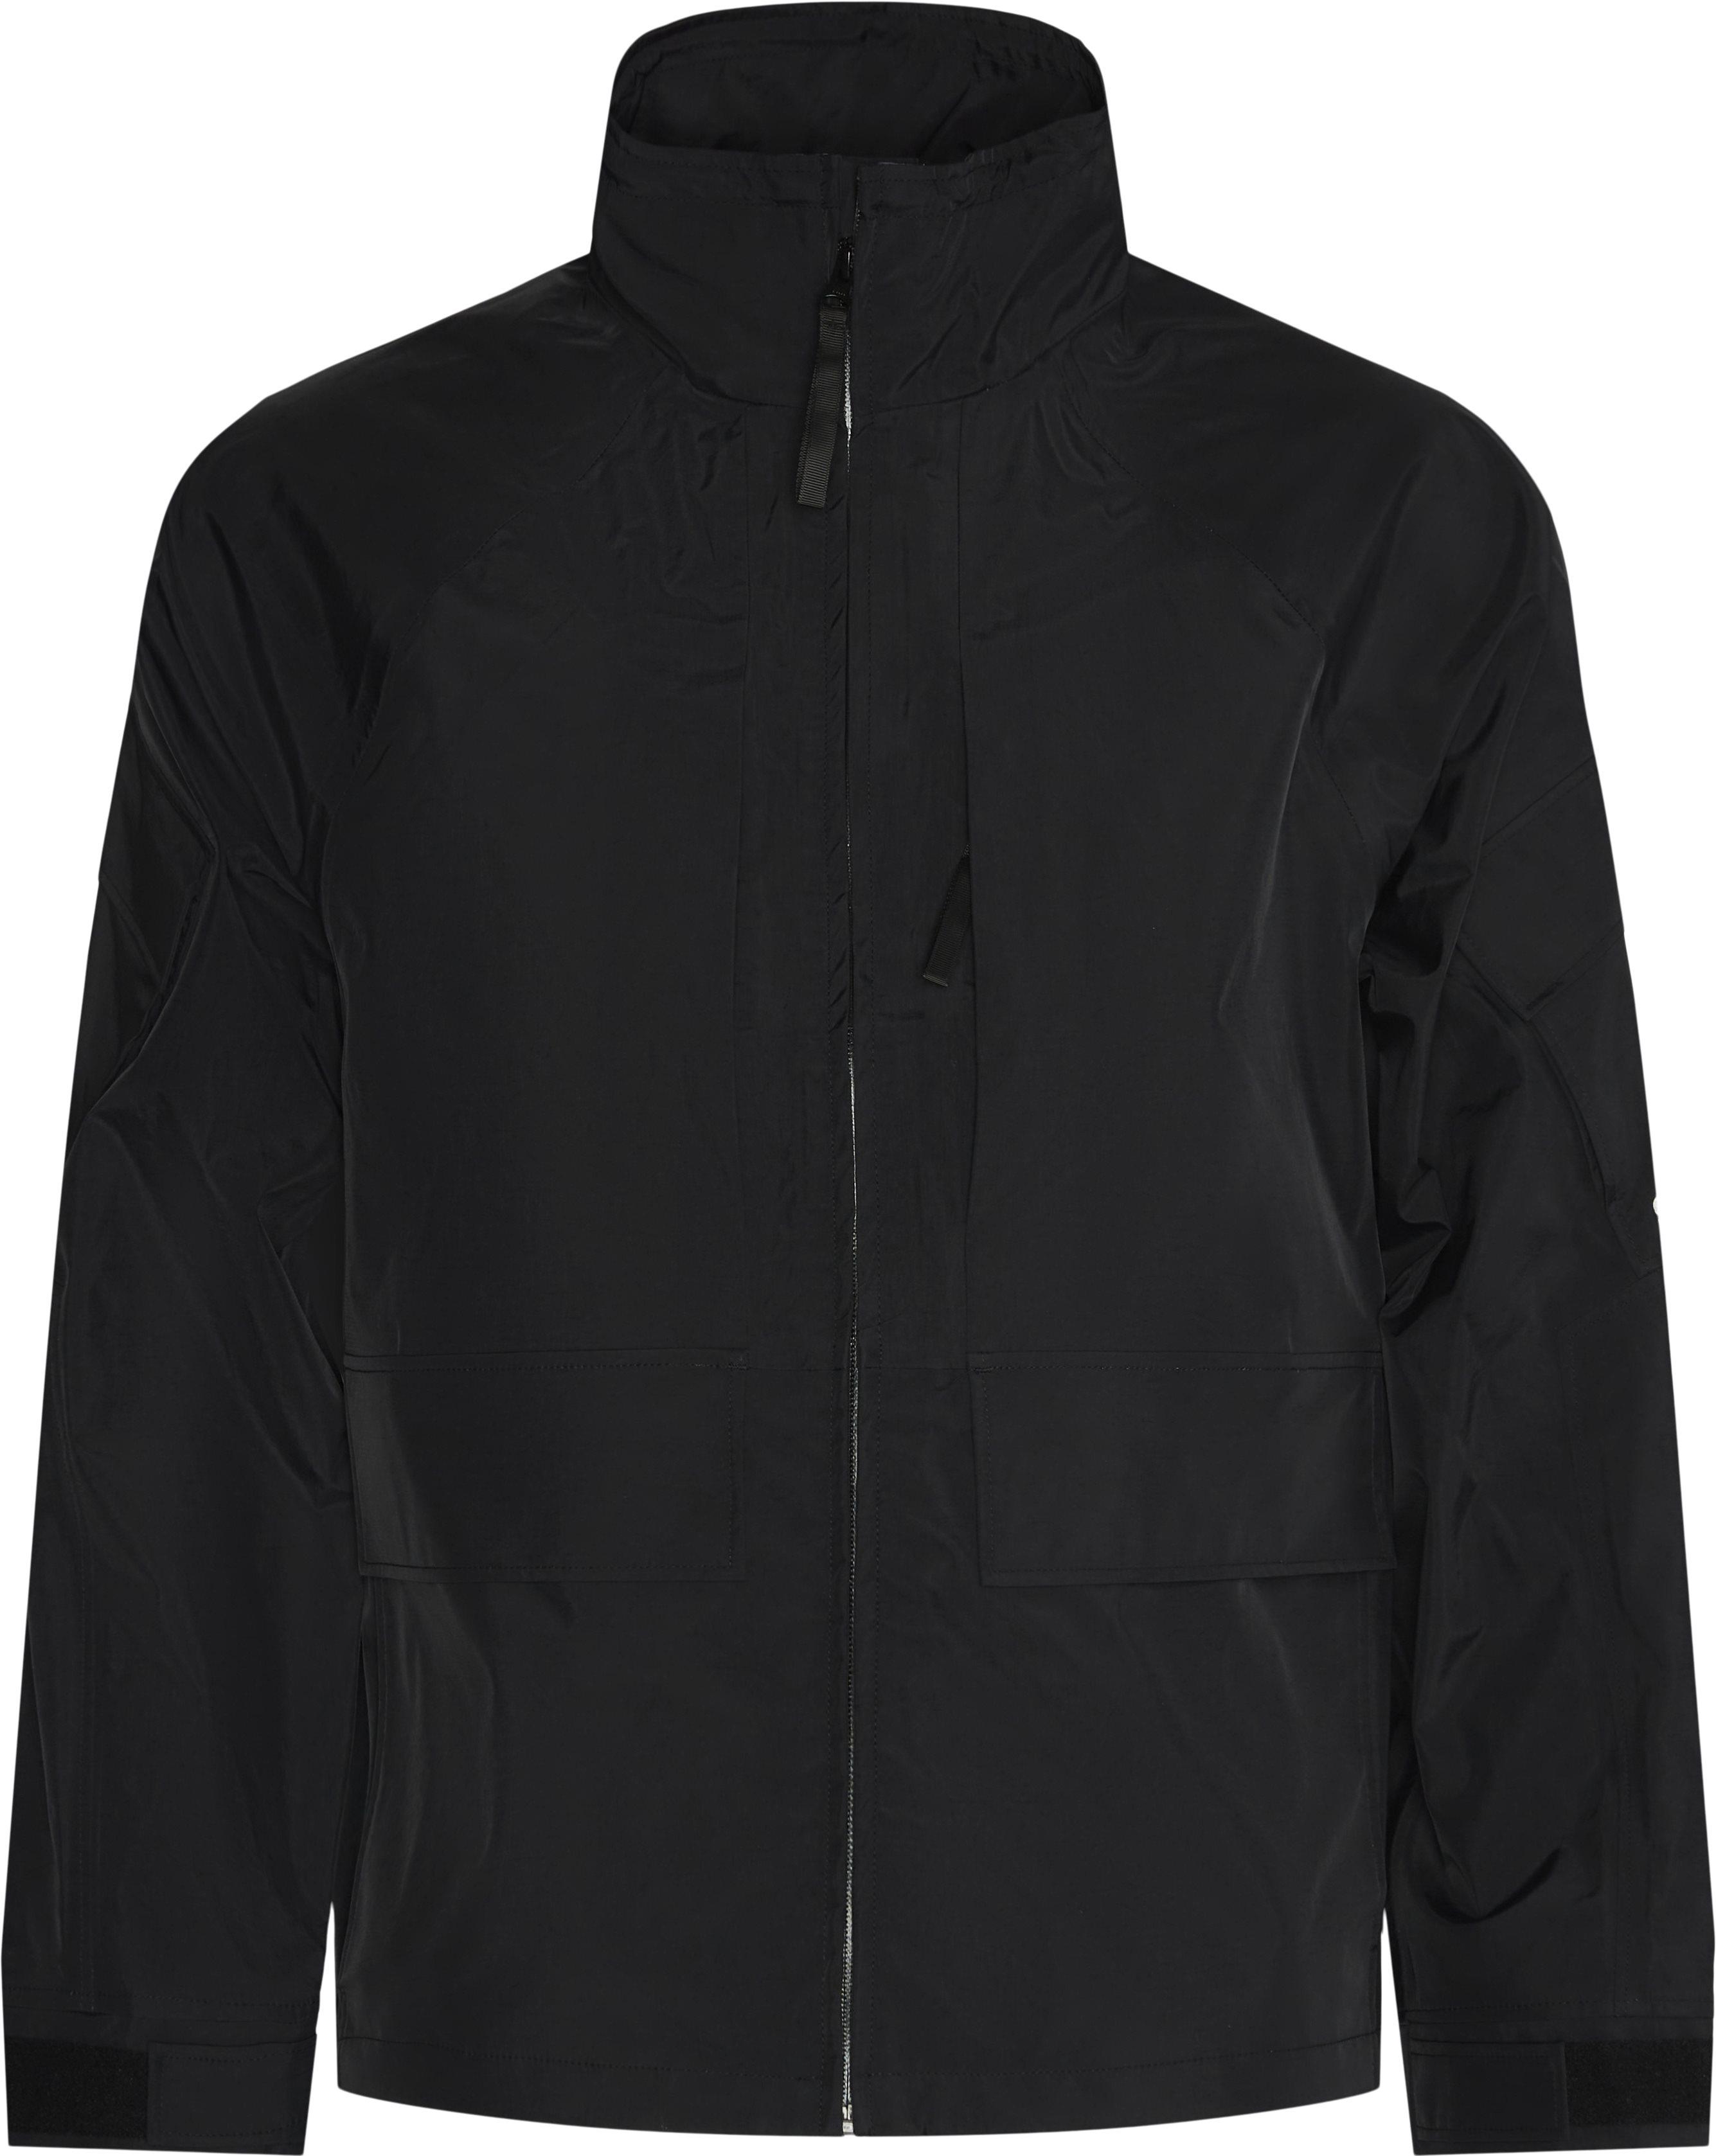 Apex Shell Jacket - Jakker - Regular - Sort